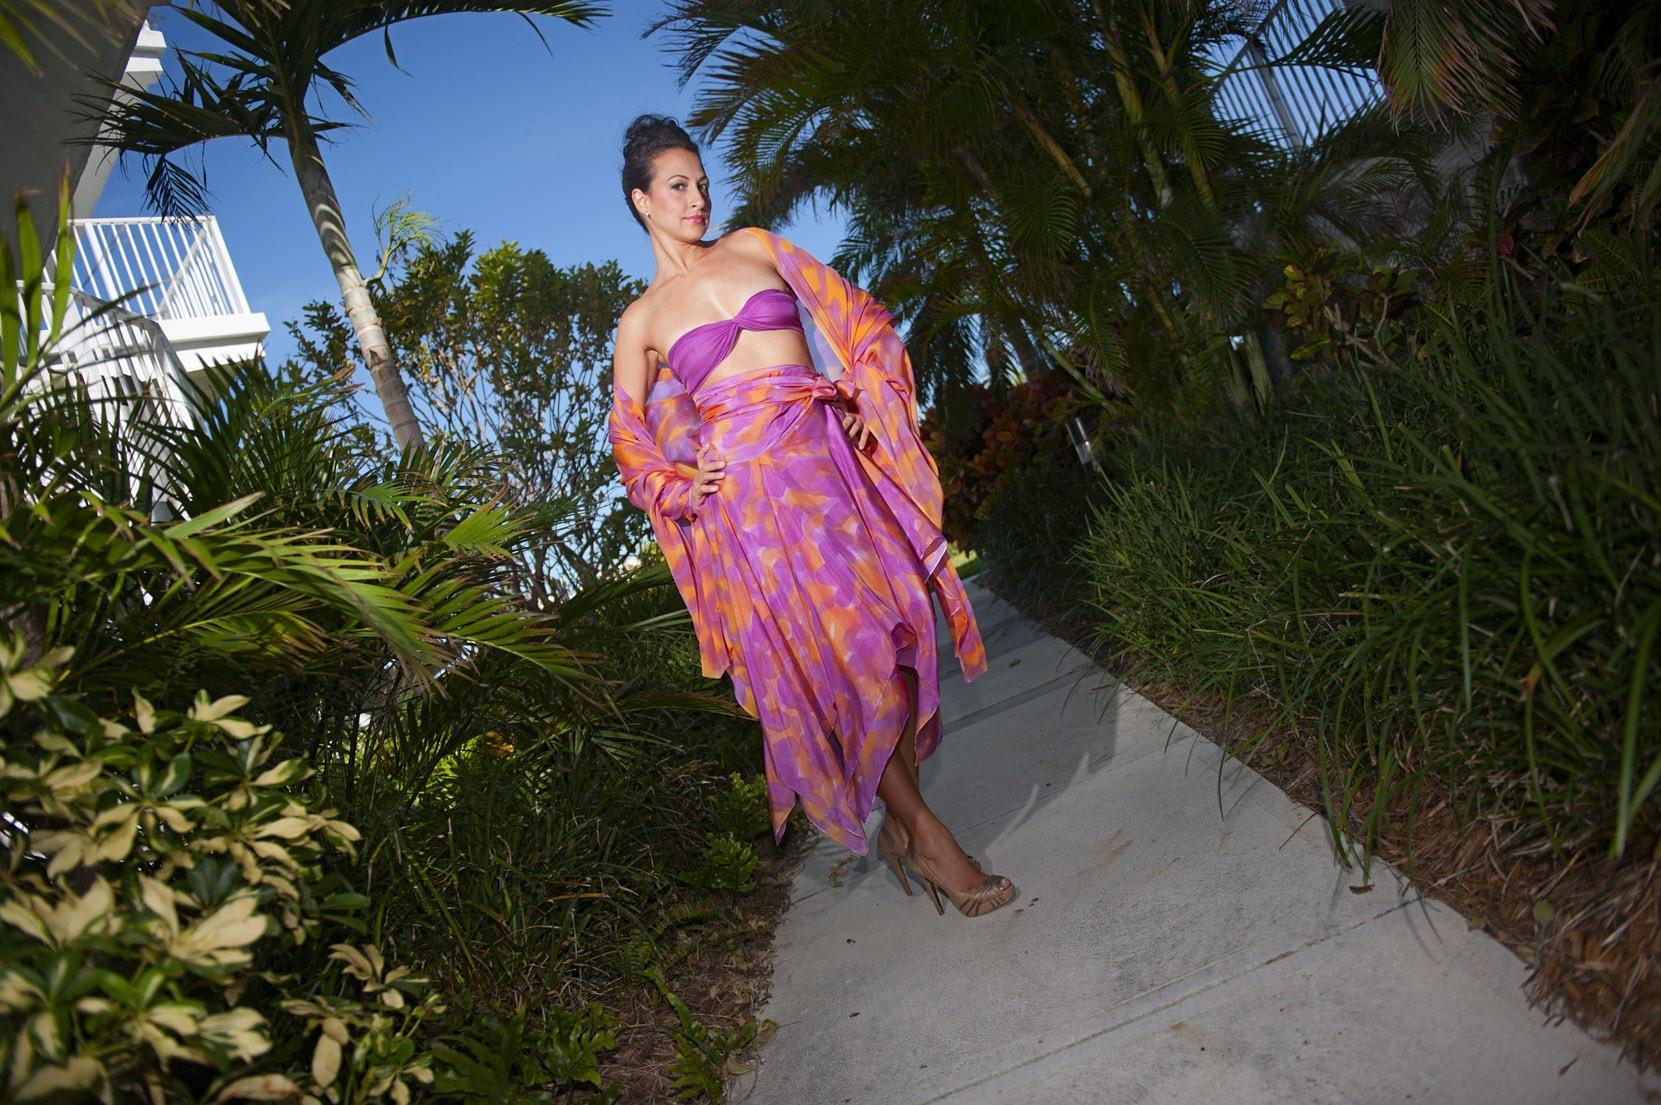 Custom Wedding dresses for beach weddings - Look Book for Dominica - Look 7 front